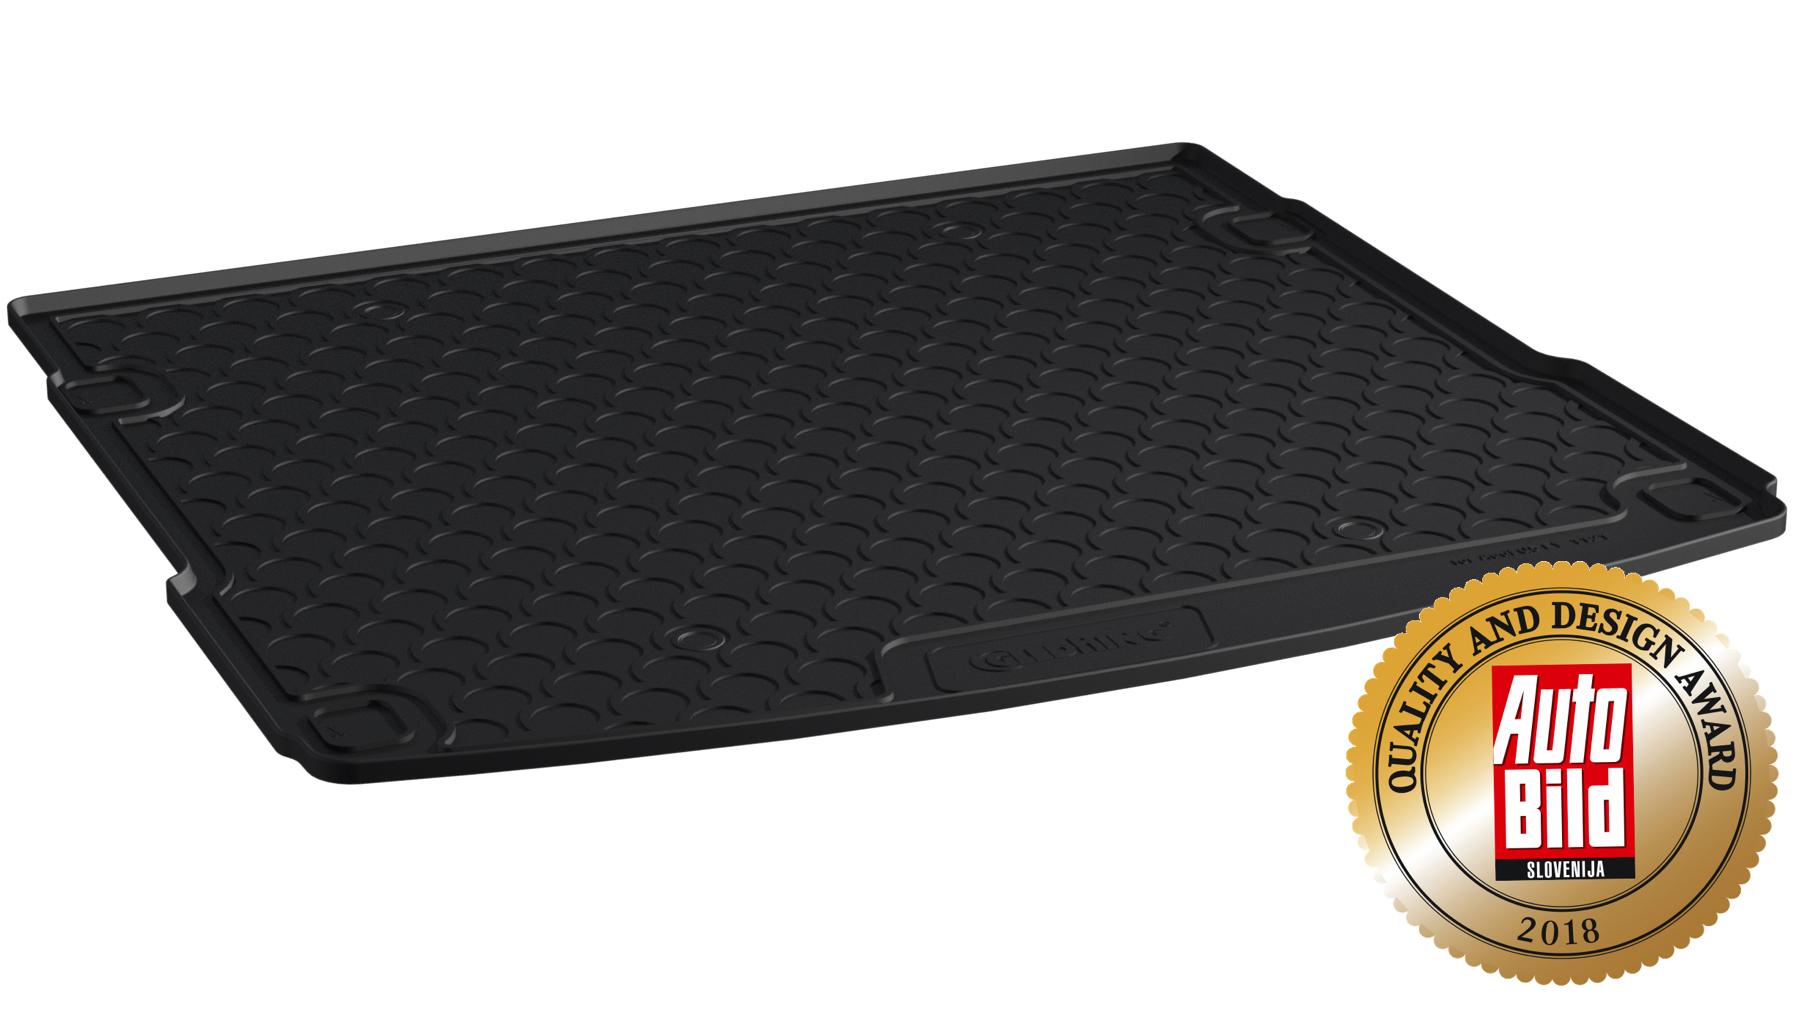 design gummi kofferraumwanne kofferraummatte passgenau. Black Bedroom Furniture Sets. Home Design Ideas